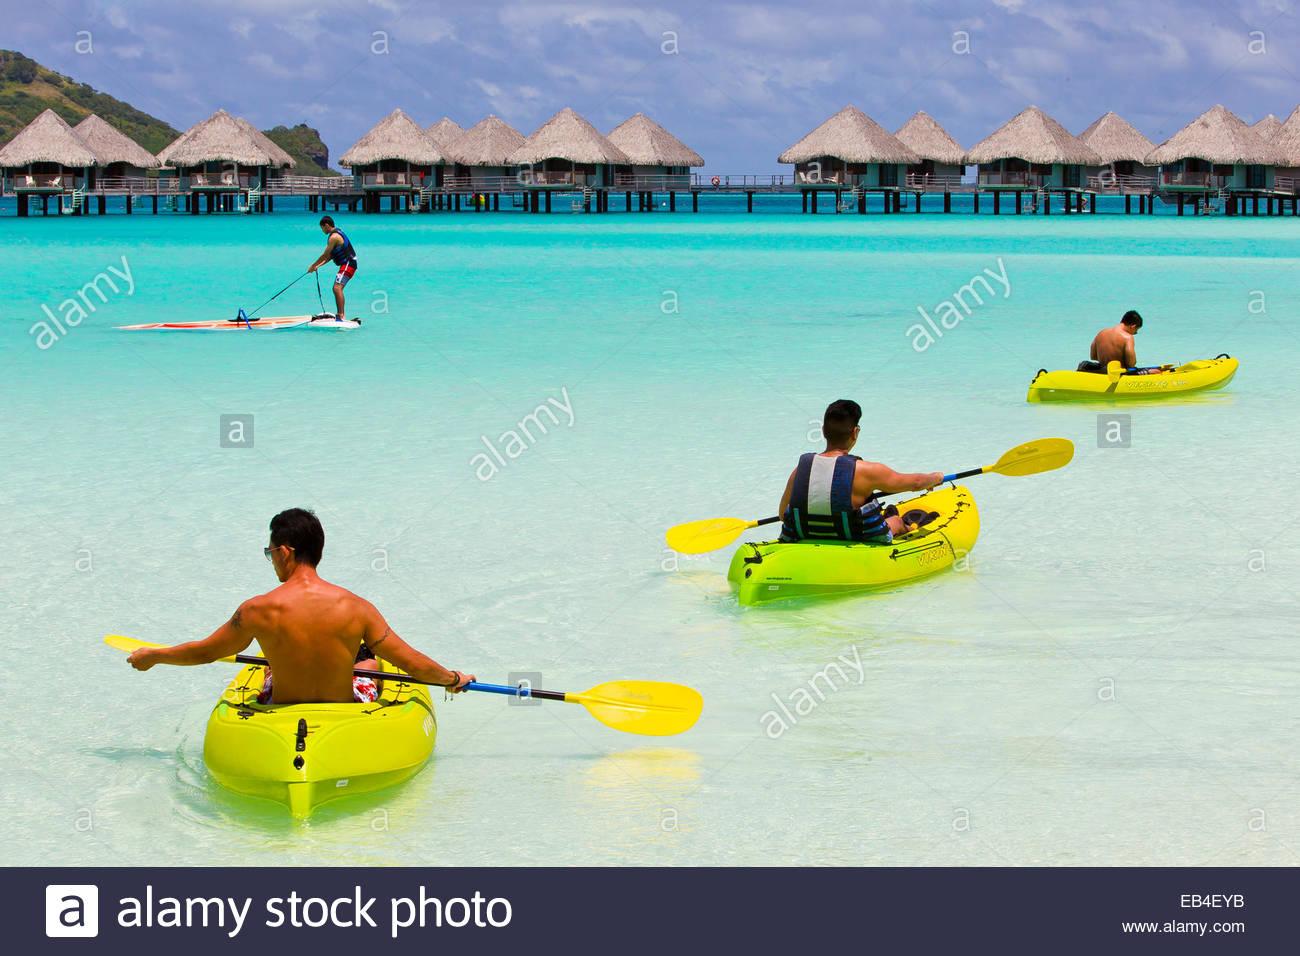 Tourists kayaking and wind surfing off the coast of Bora Bora. - Stock Image